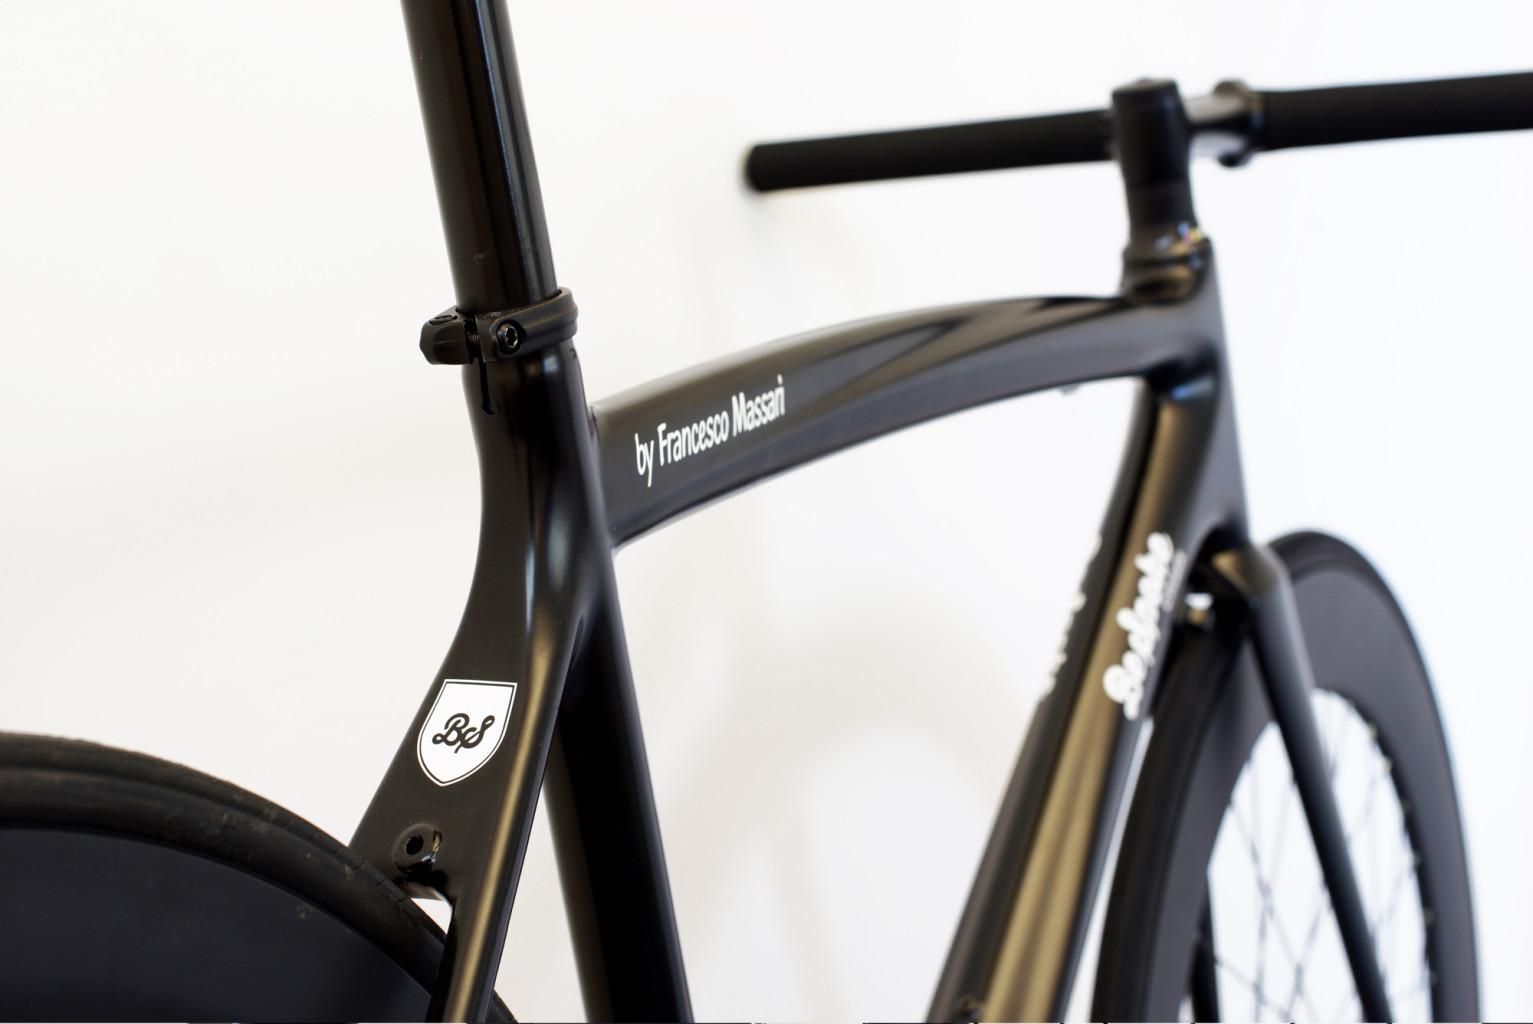 Bespoke bike 20